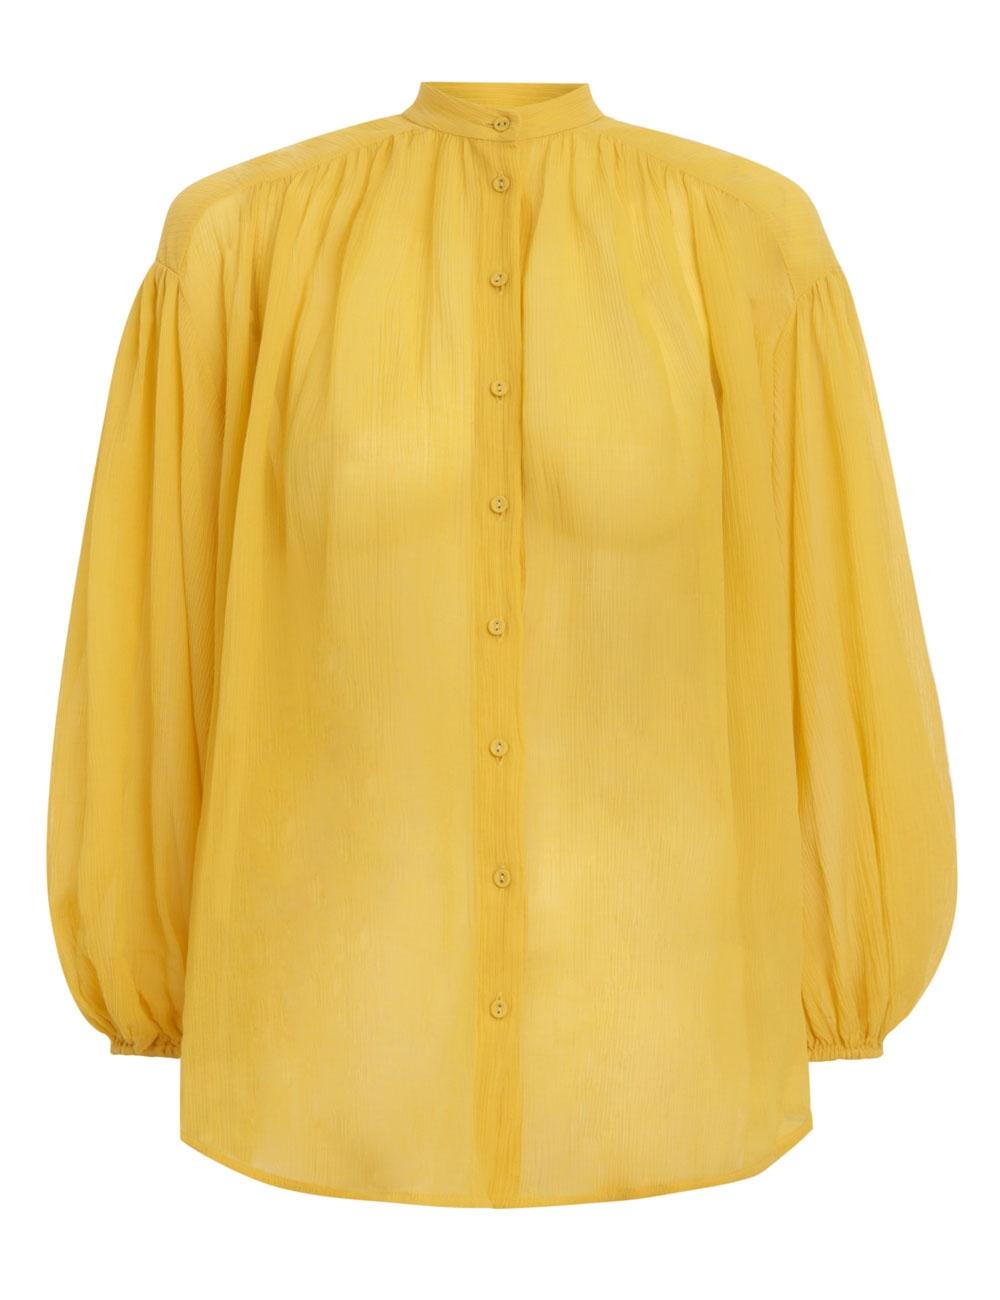 Bonita Crinkle Shirt